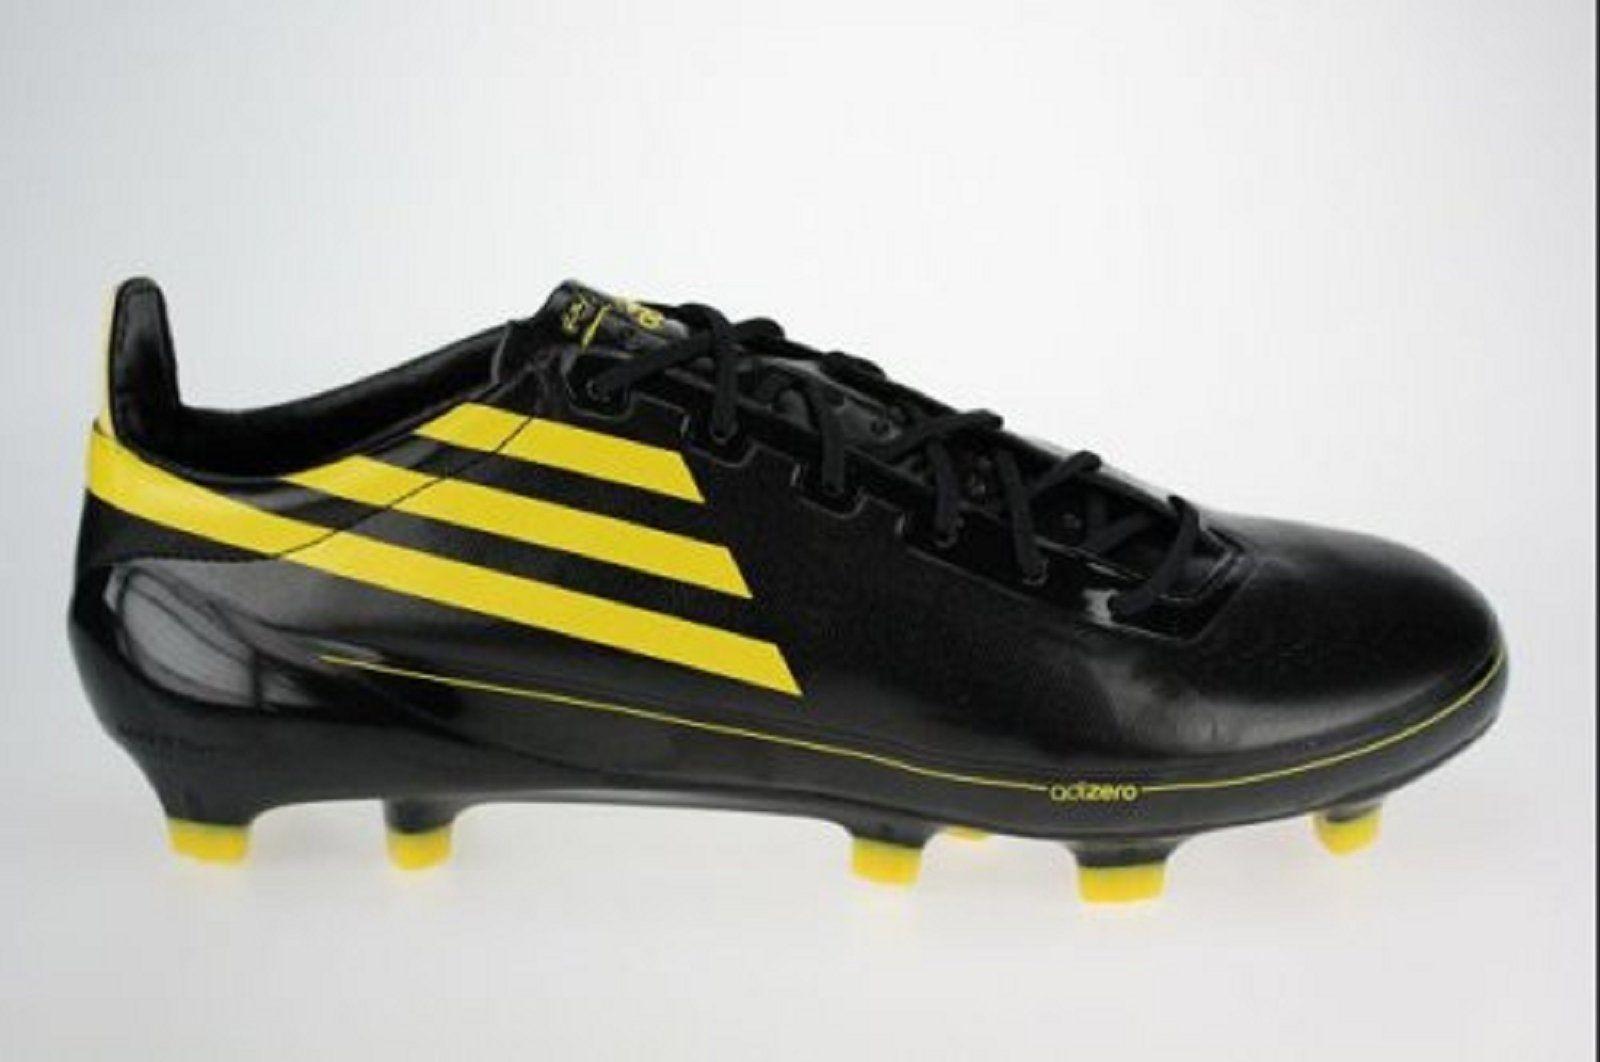 adidas f50 jaune noir